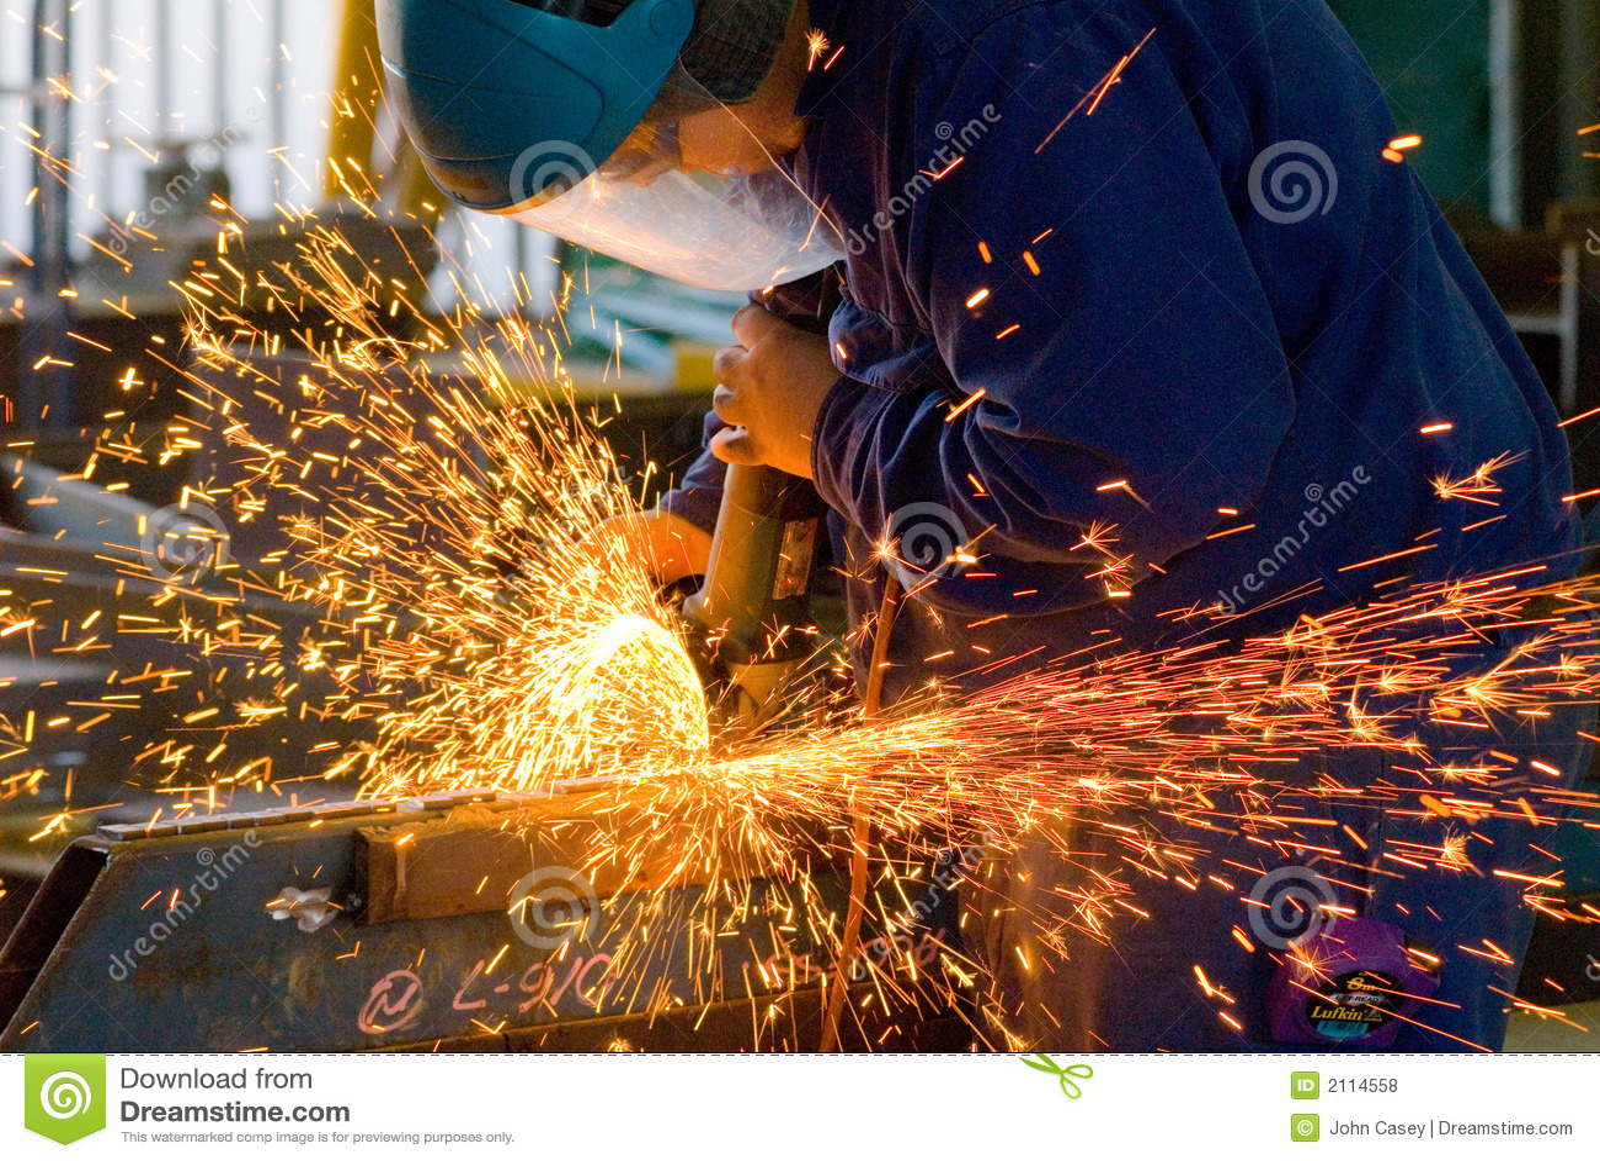 Männer an reibendem Stahl der Arbeit